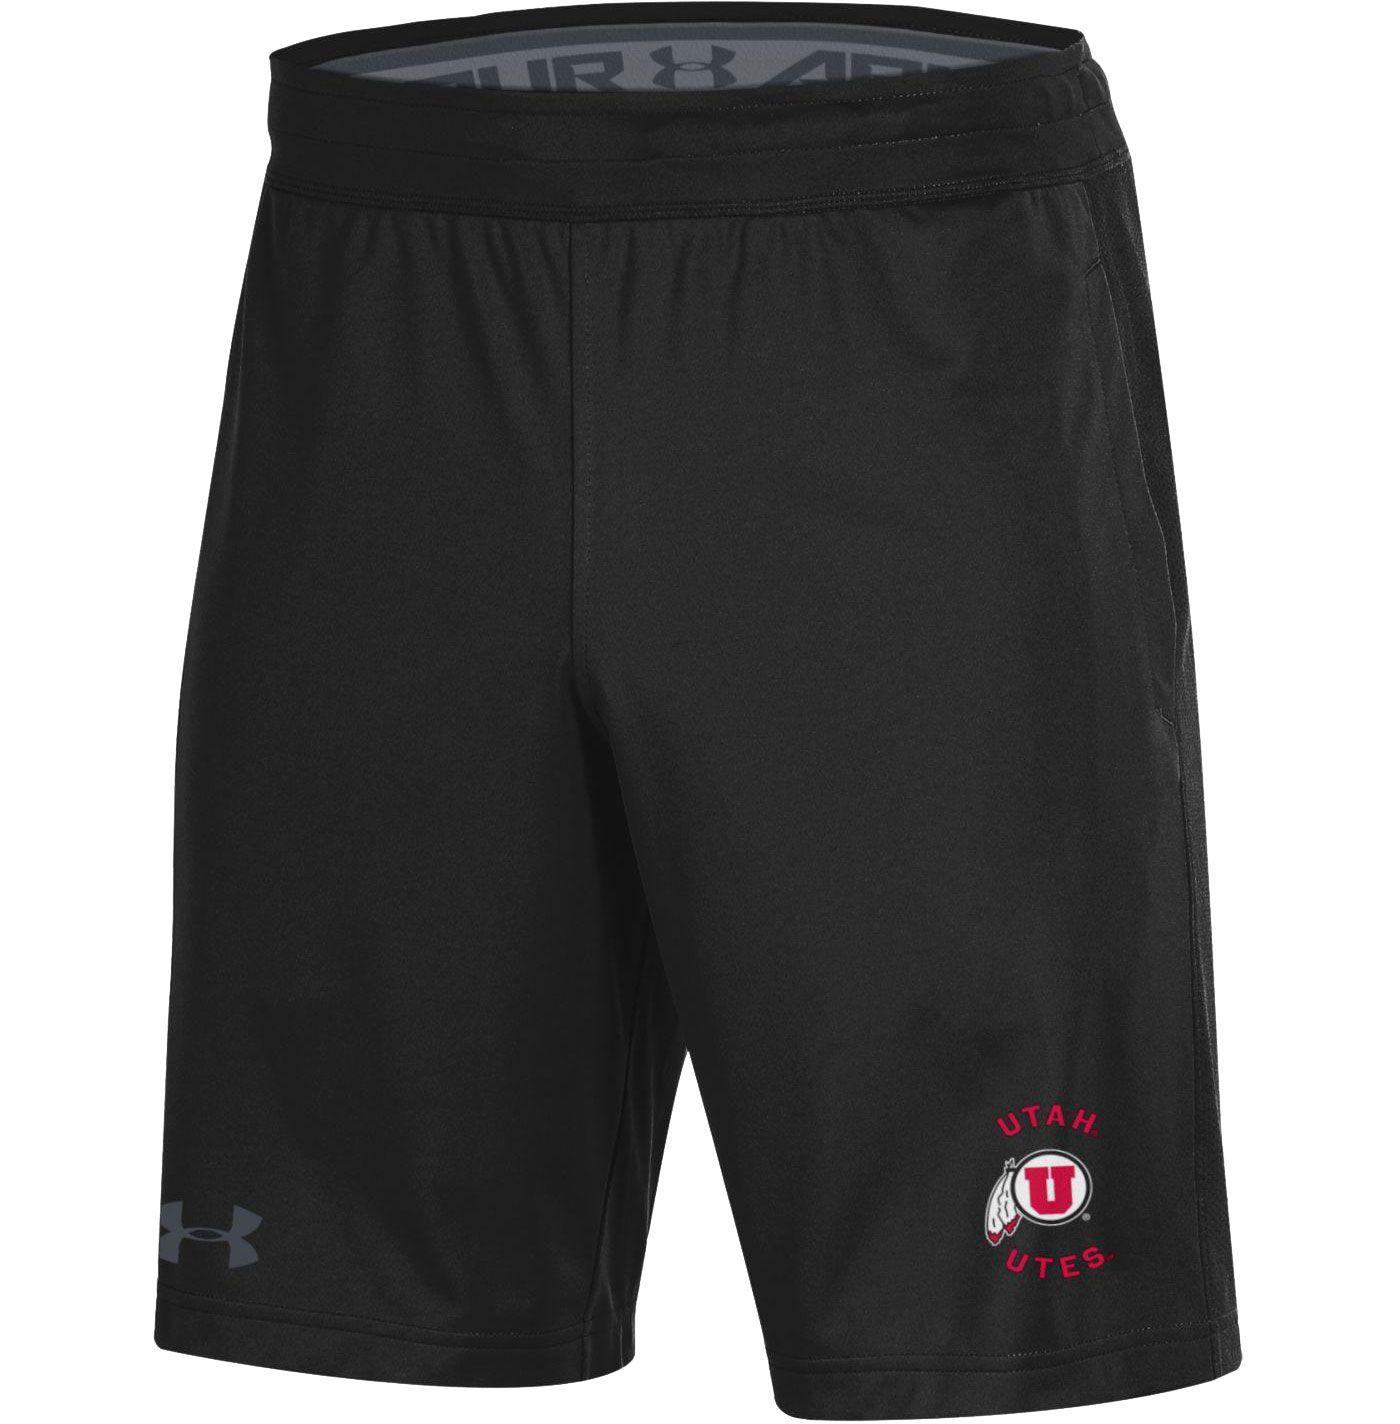 Under Armour Men's Utah Utes Raid Performance Black Shorts